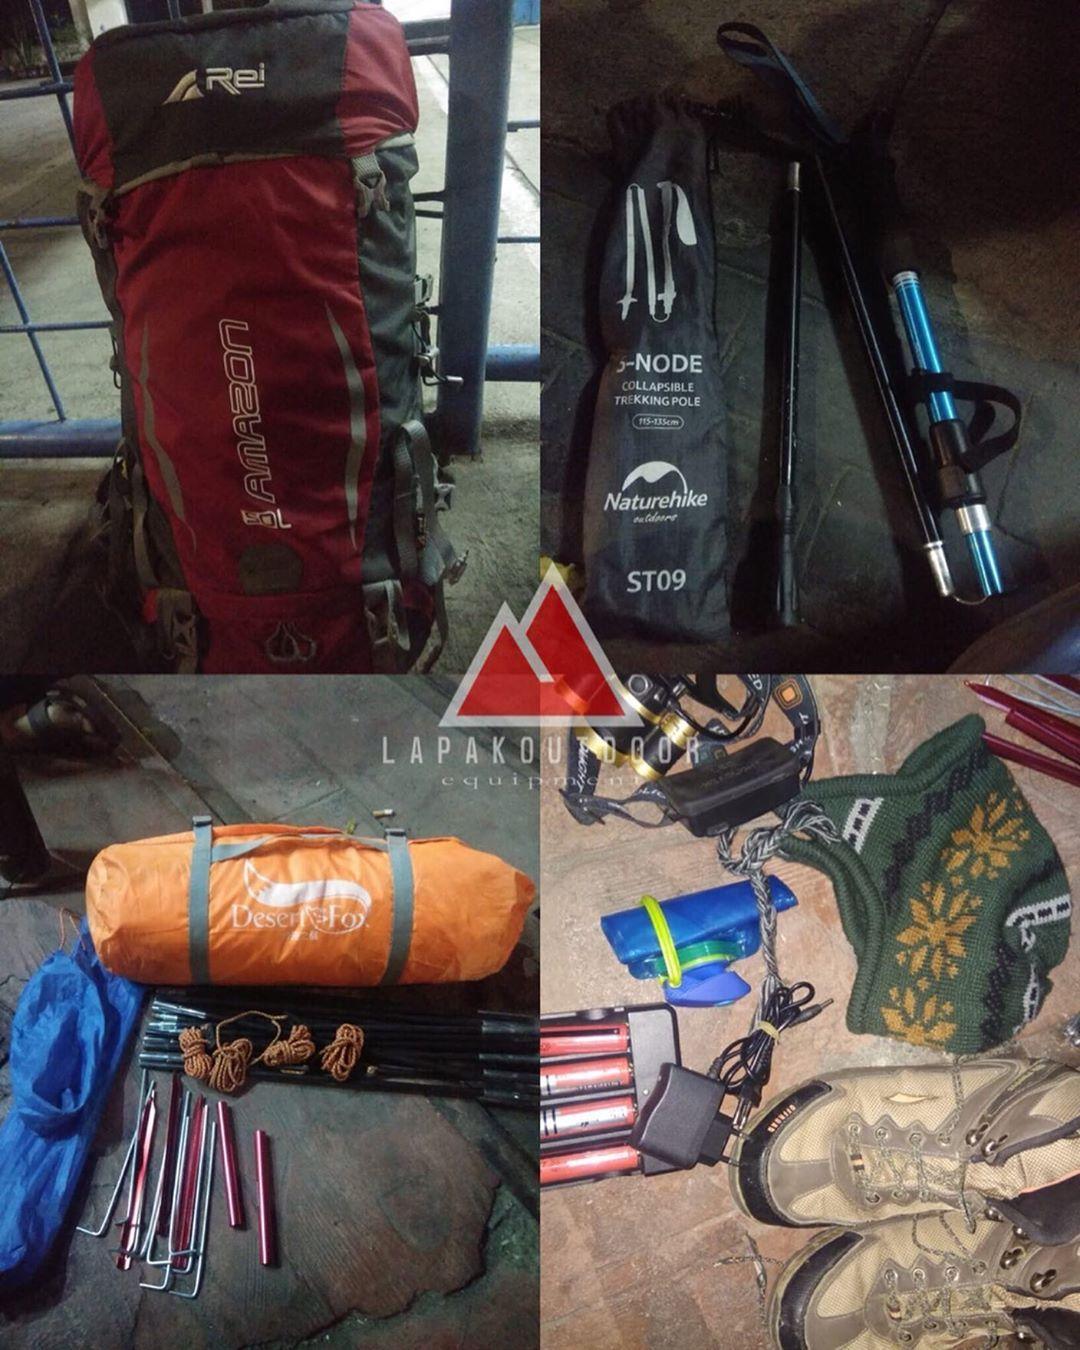 Paket Lengkap Tinggal Nanjak Nanjak Gemes Carrier Rc Sb